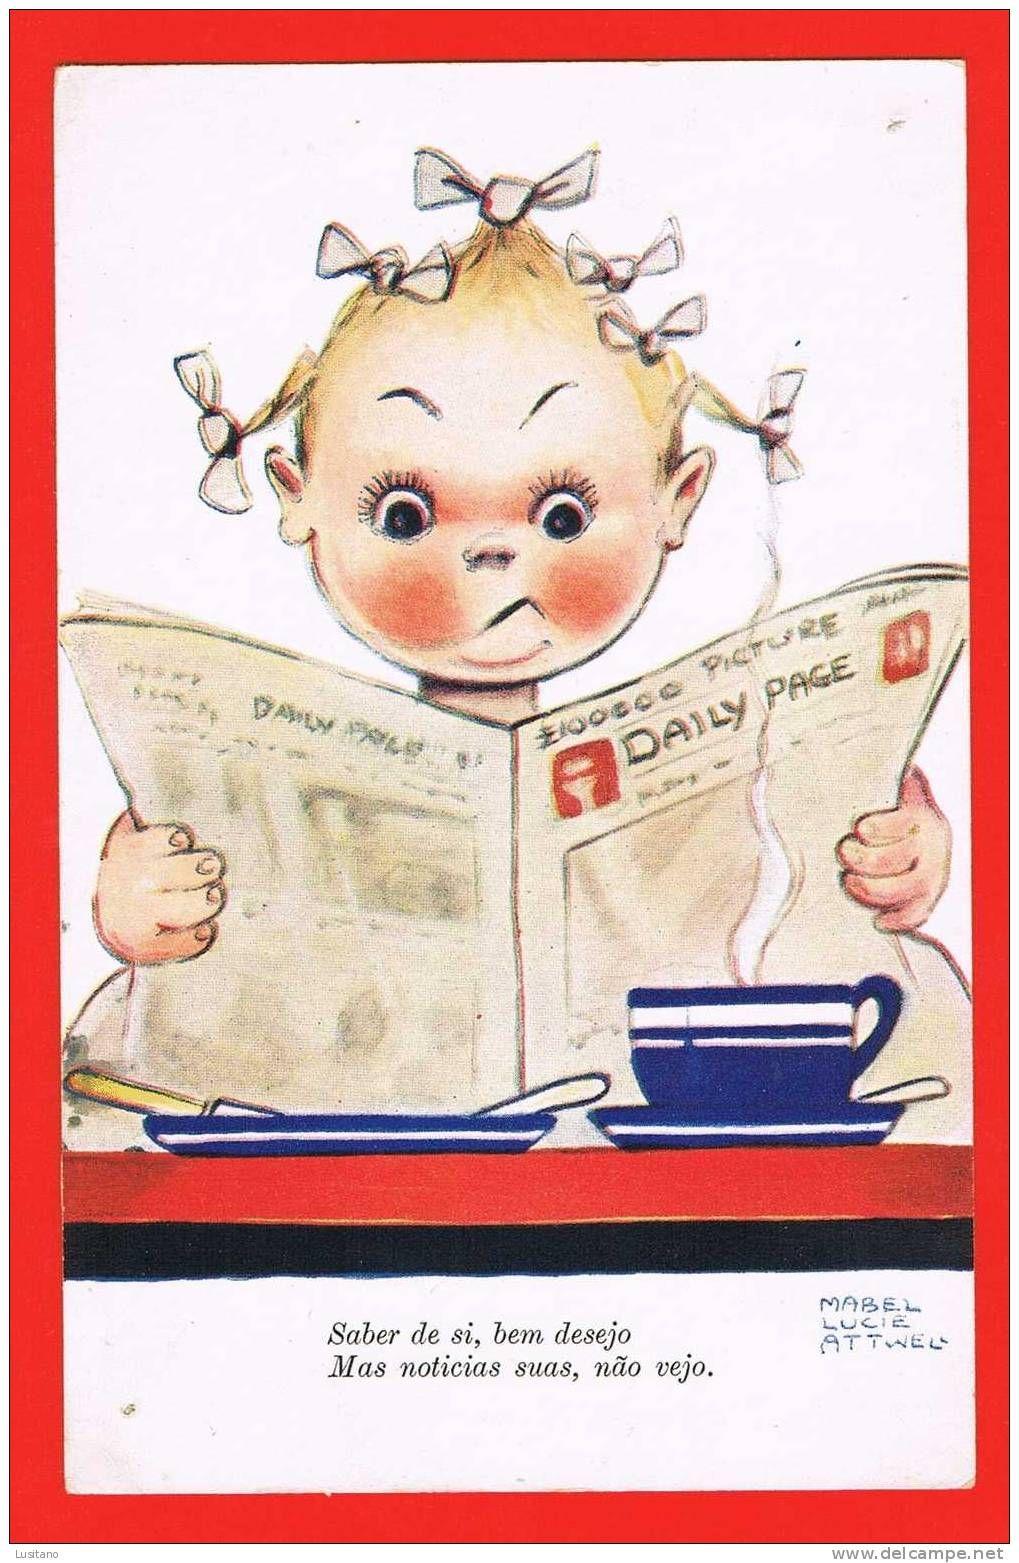 Mabel Lucie Attwell card( reminds me of Wiske by studio Willy Vandersteen)